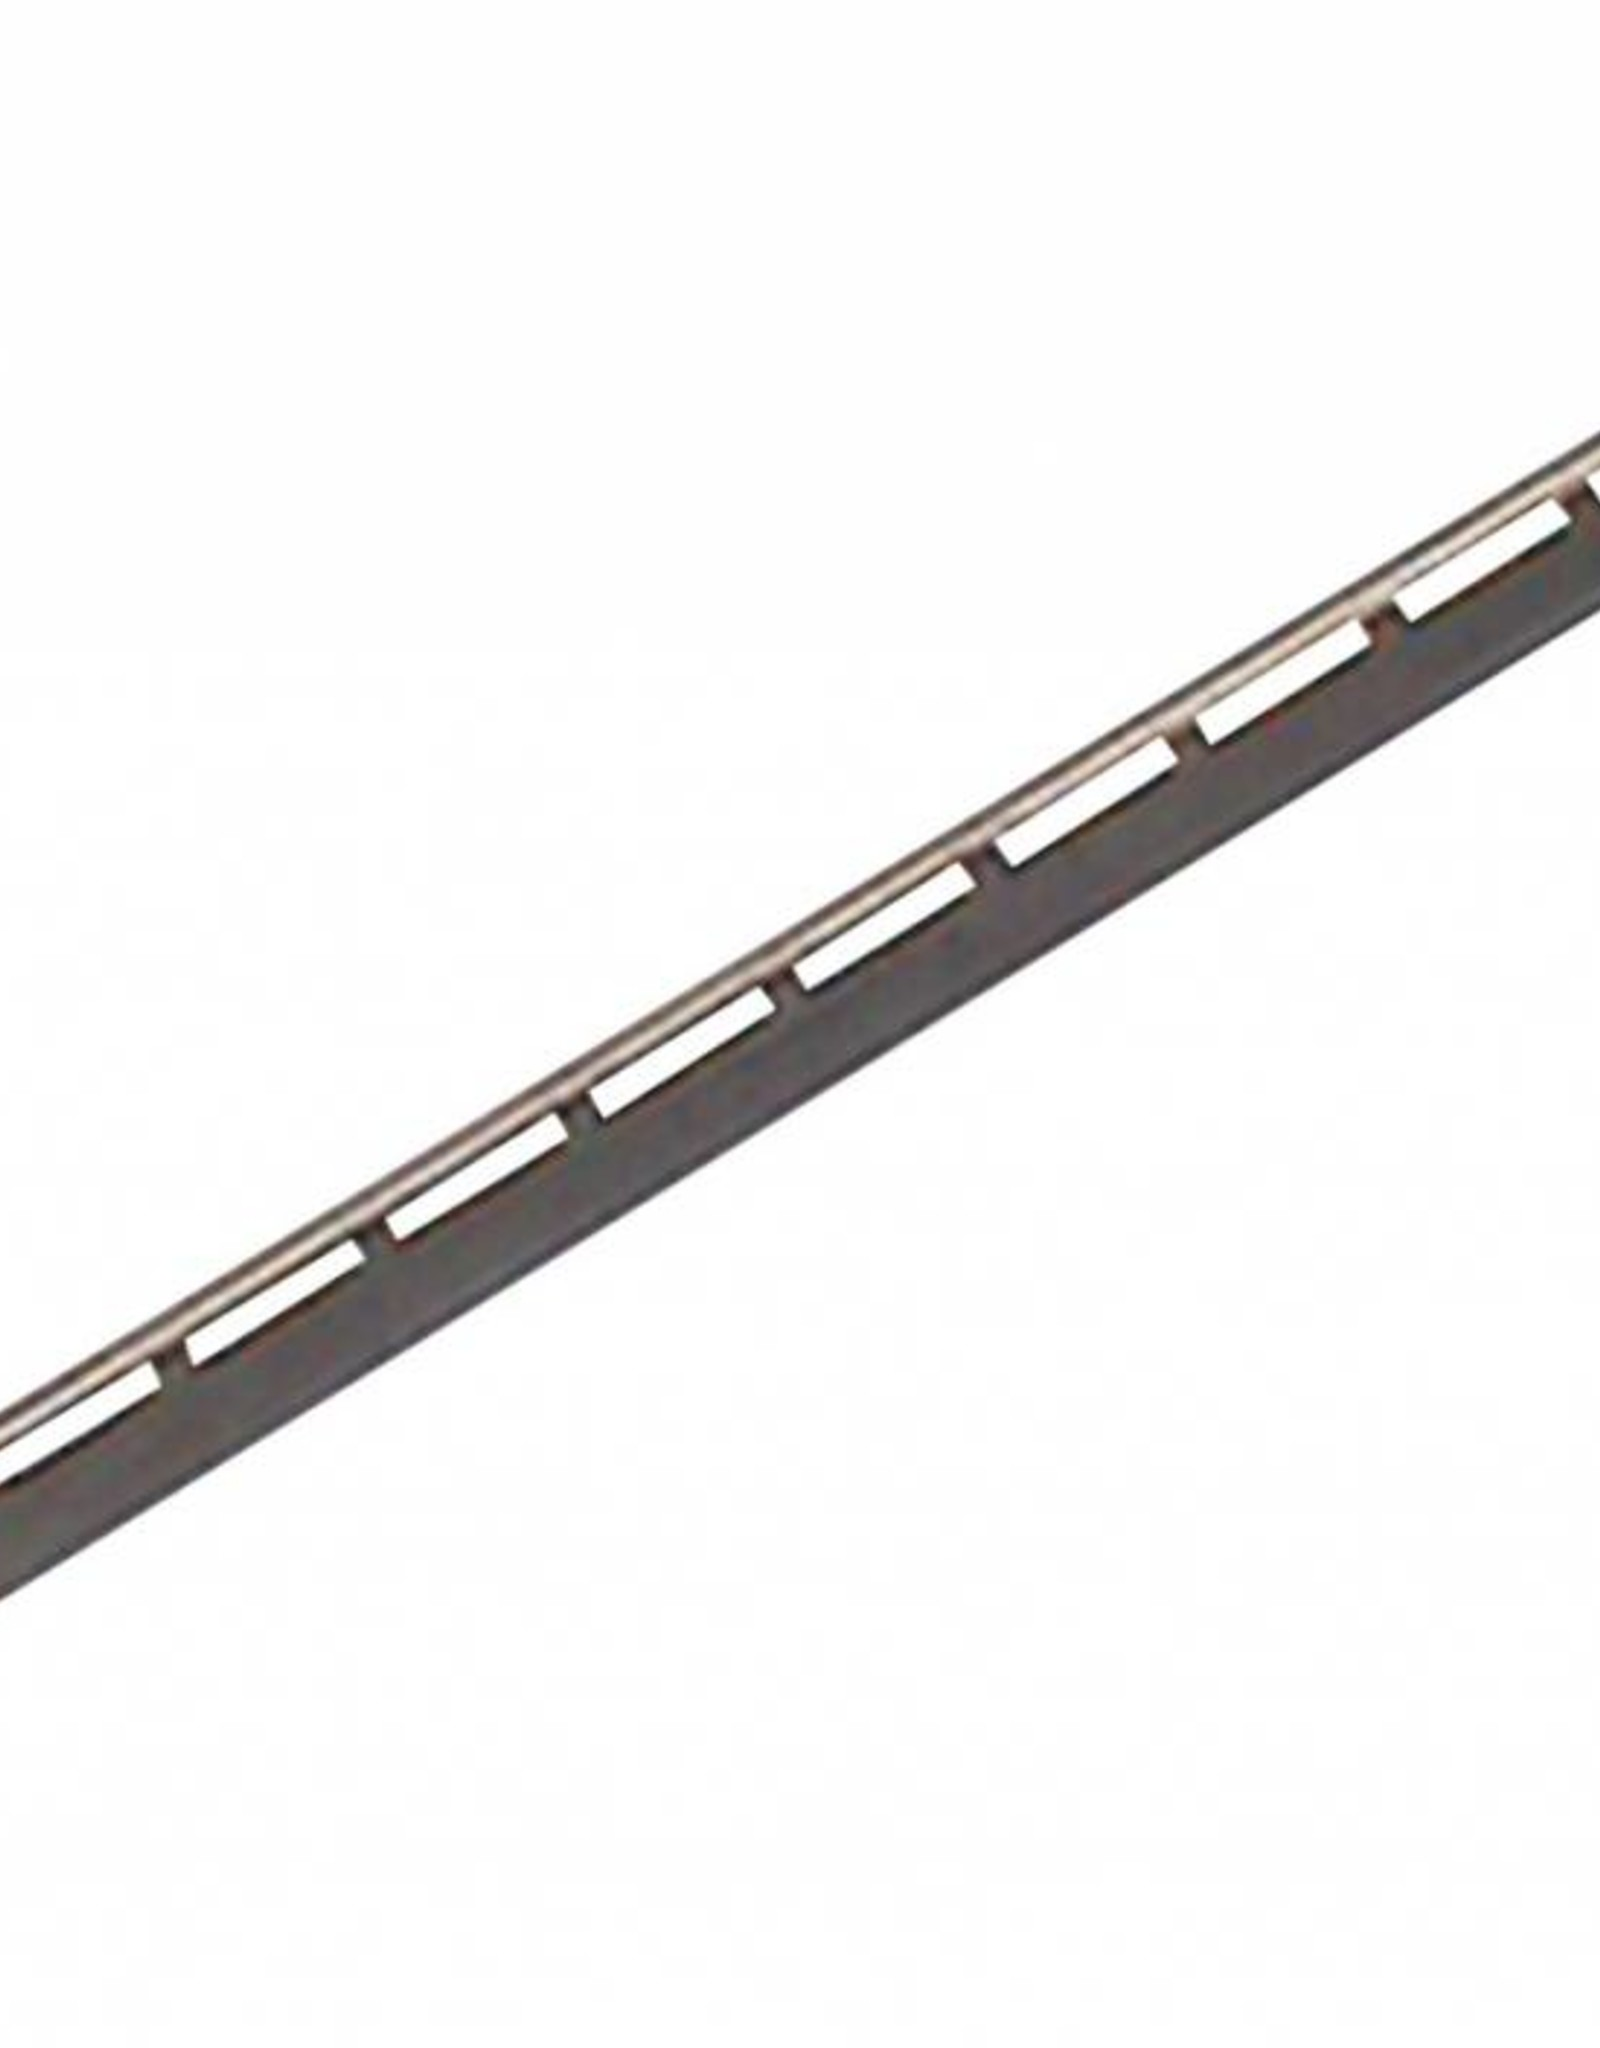 Unger S-Rail compleet met zacht rubber